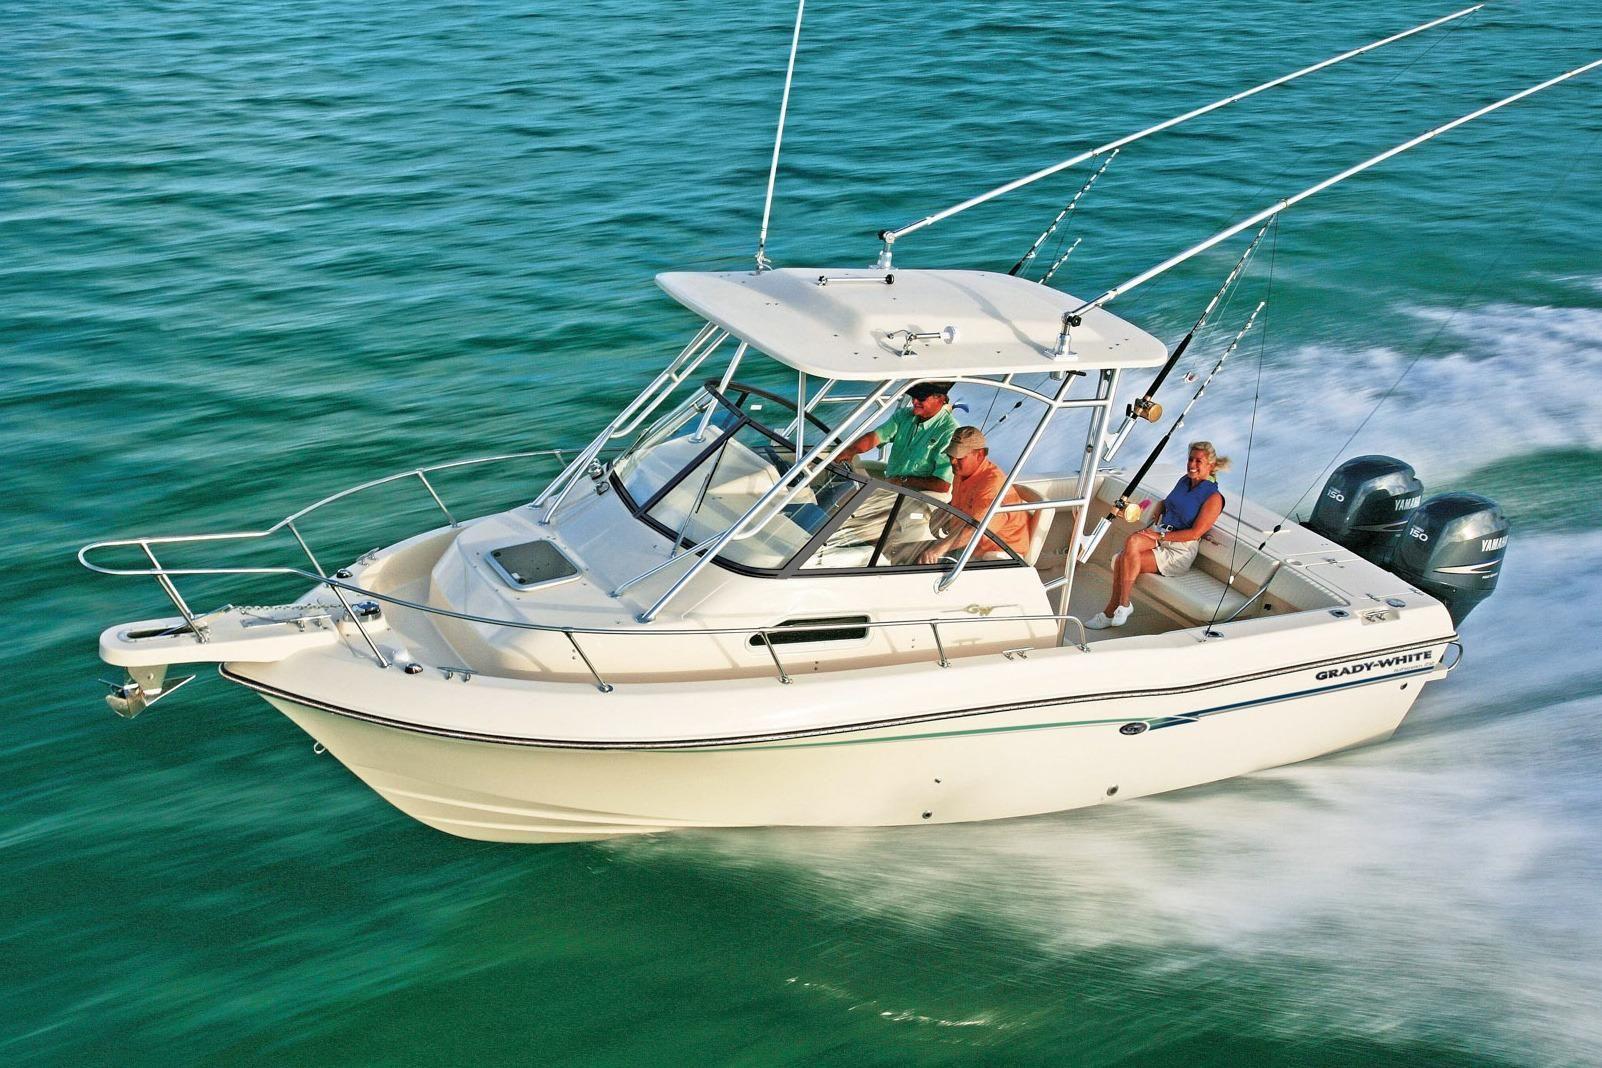 2017 grady white gulfstream 232 power boat for sale www. Black Bedroom Furniture Sets. Home Design Ideas